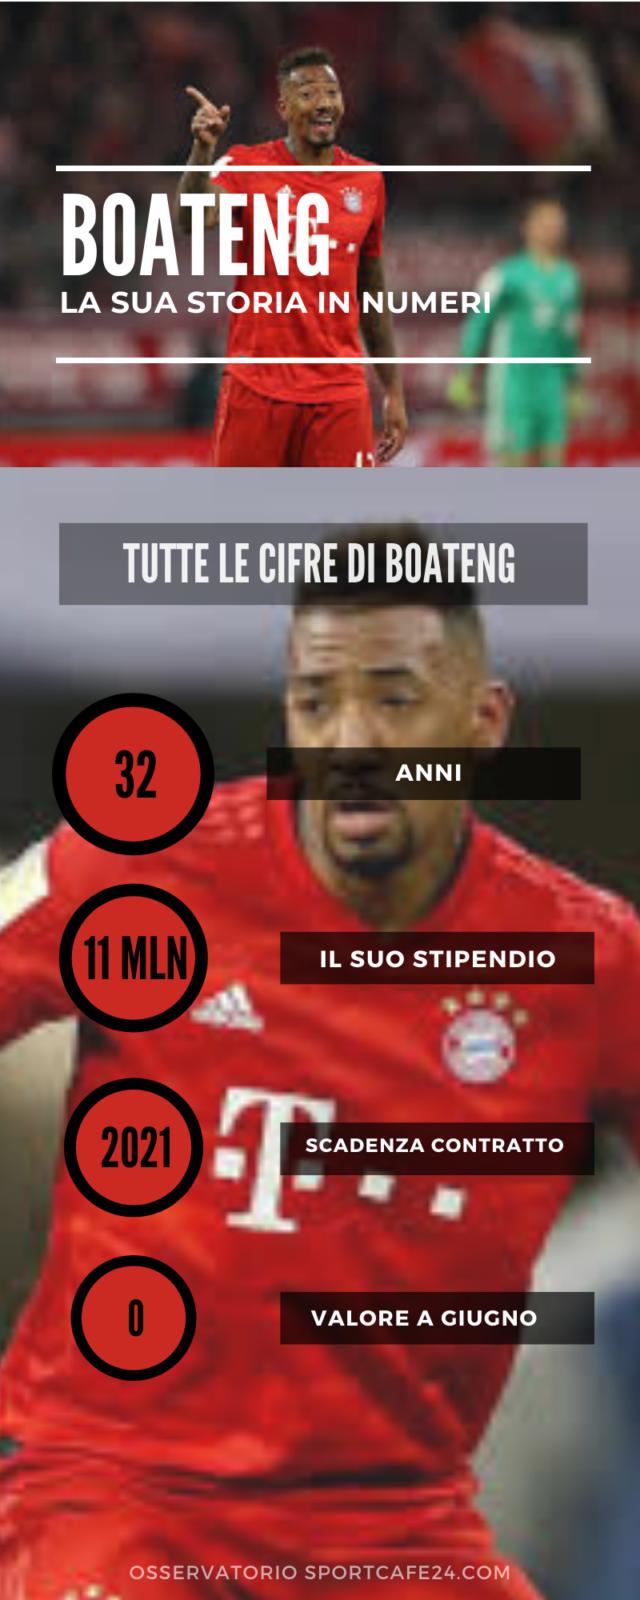 Boateng-Milan: affare a gennaio?